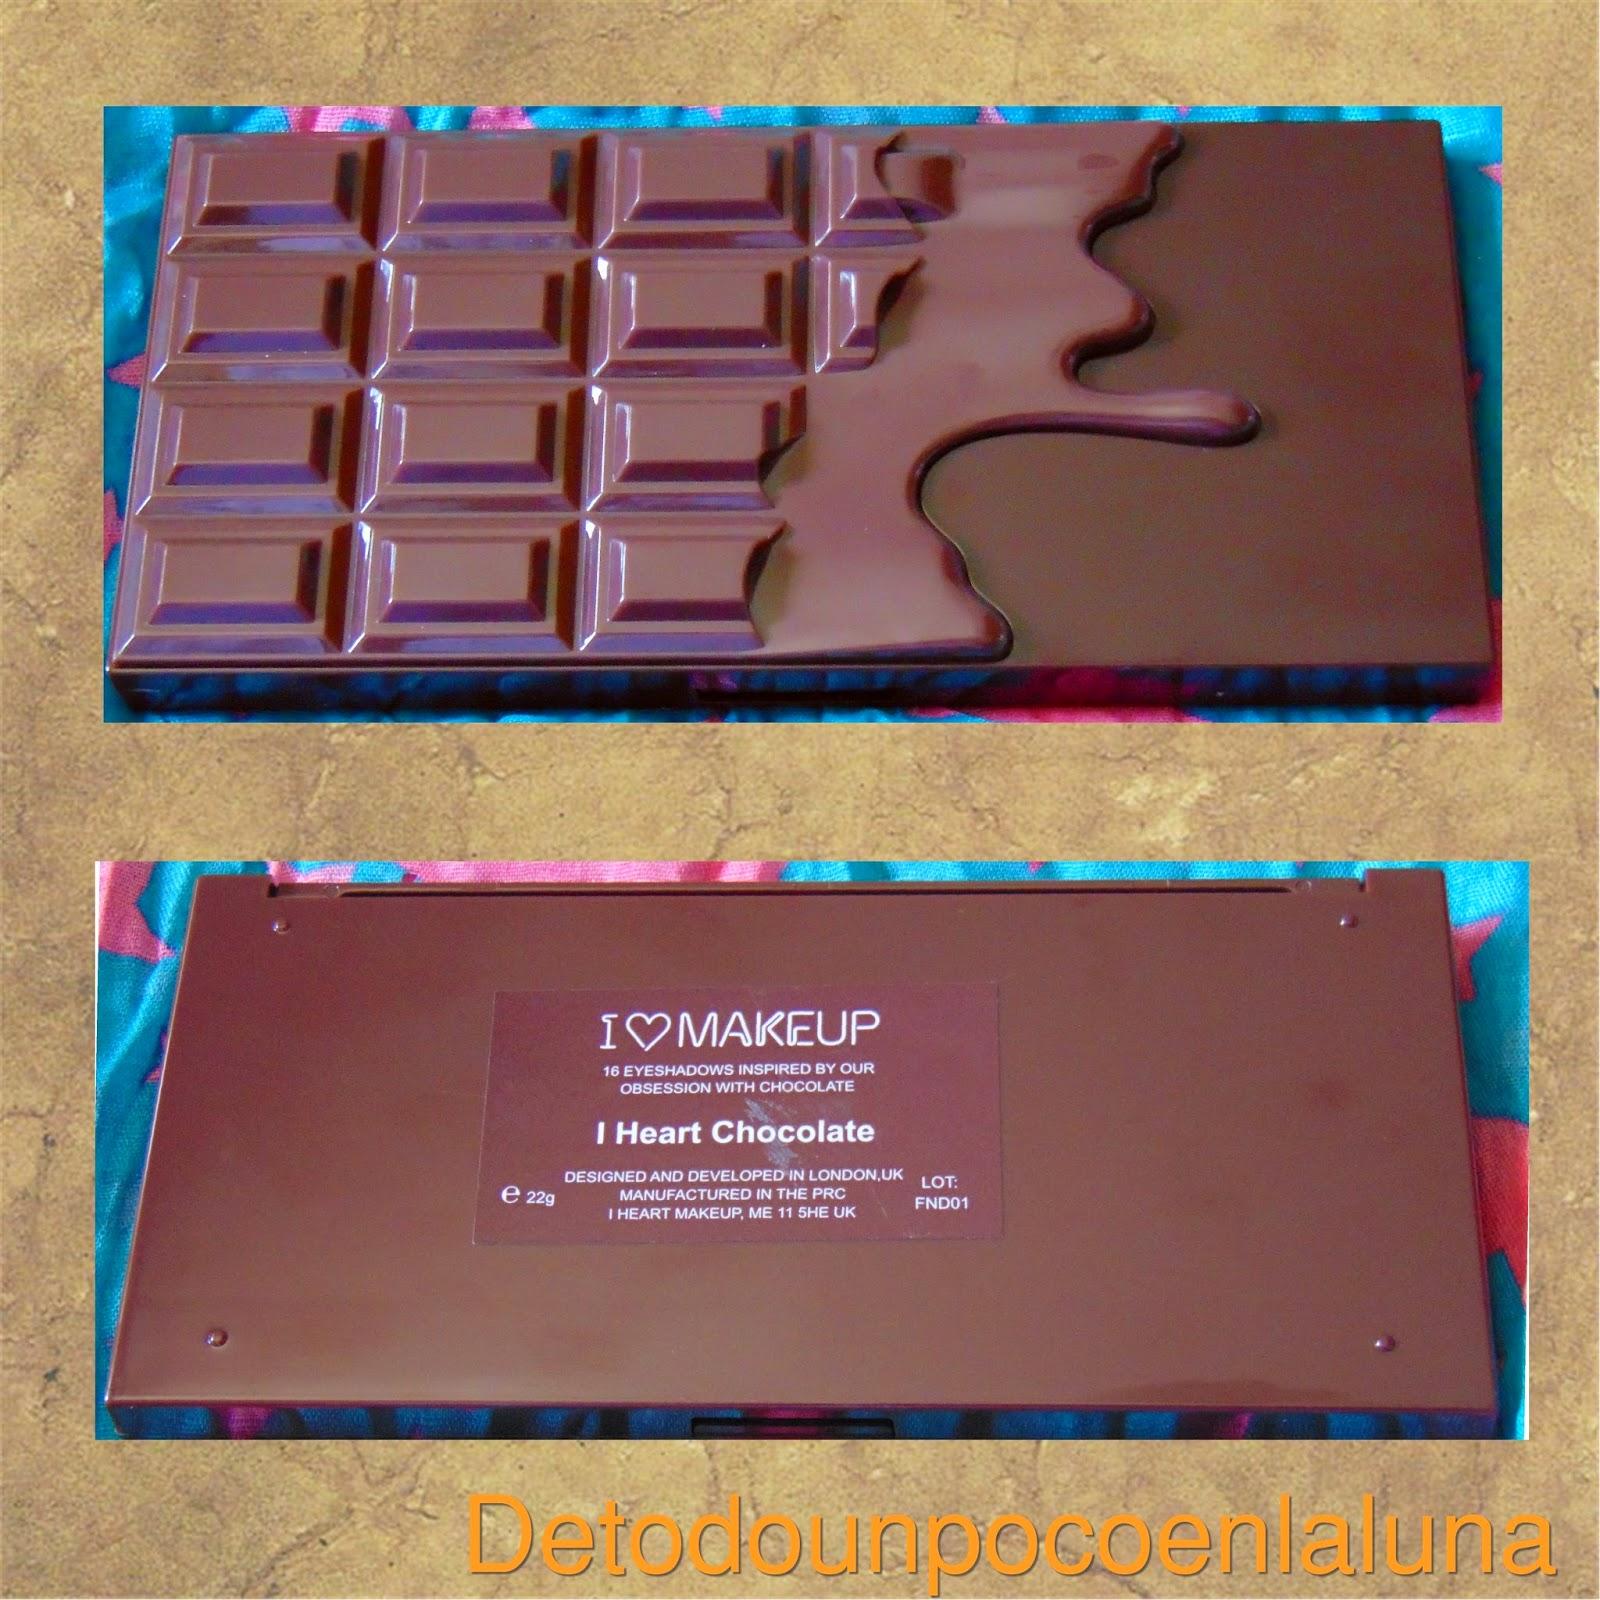 paleta I heart chocolate de I heart makeup